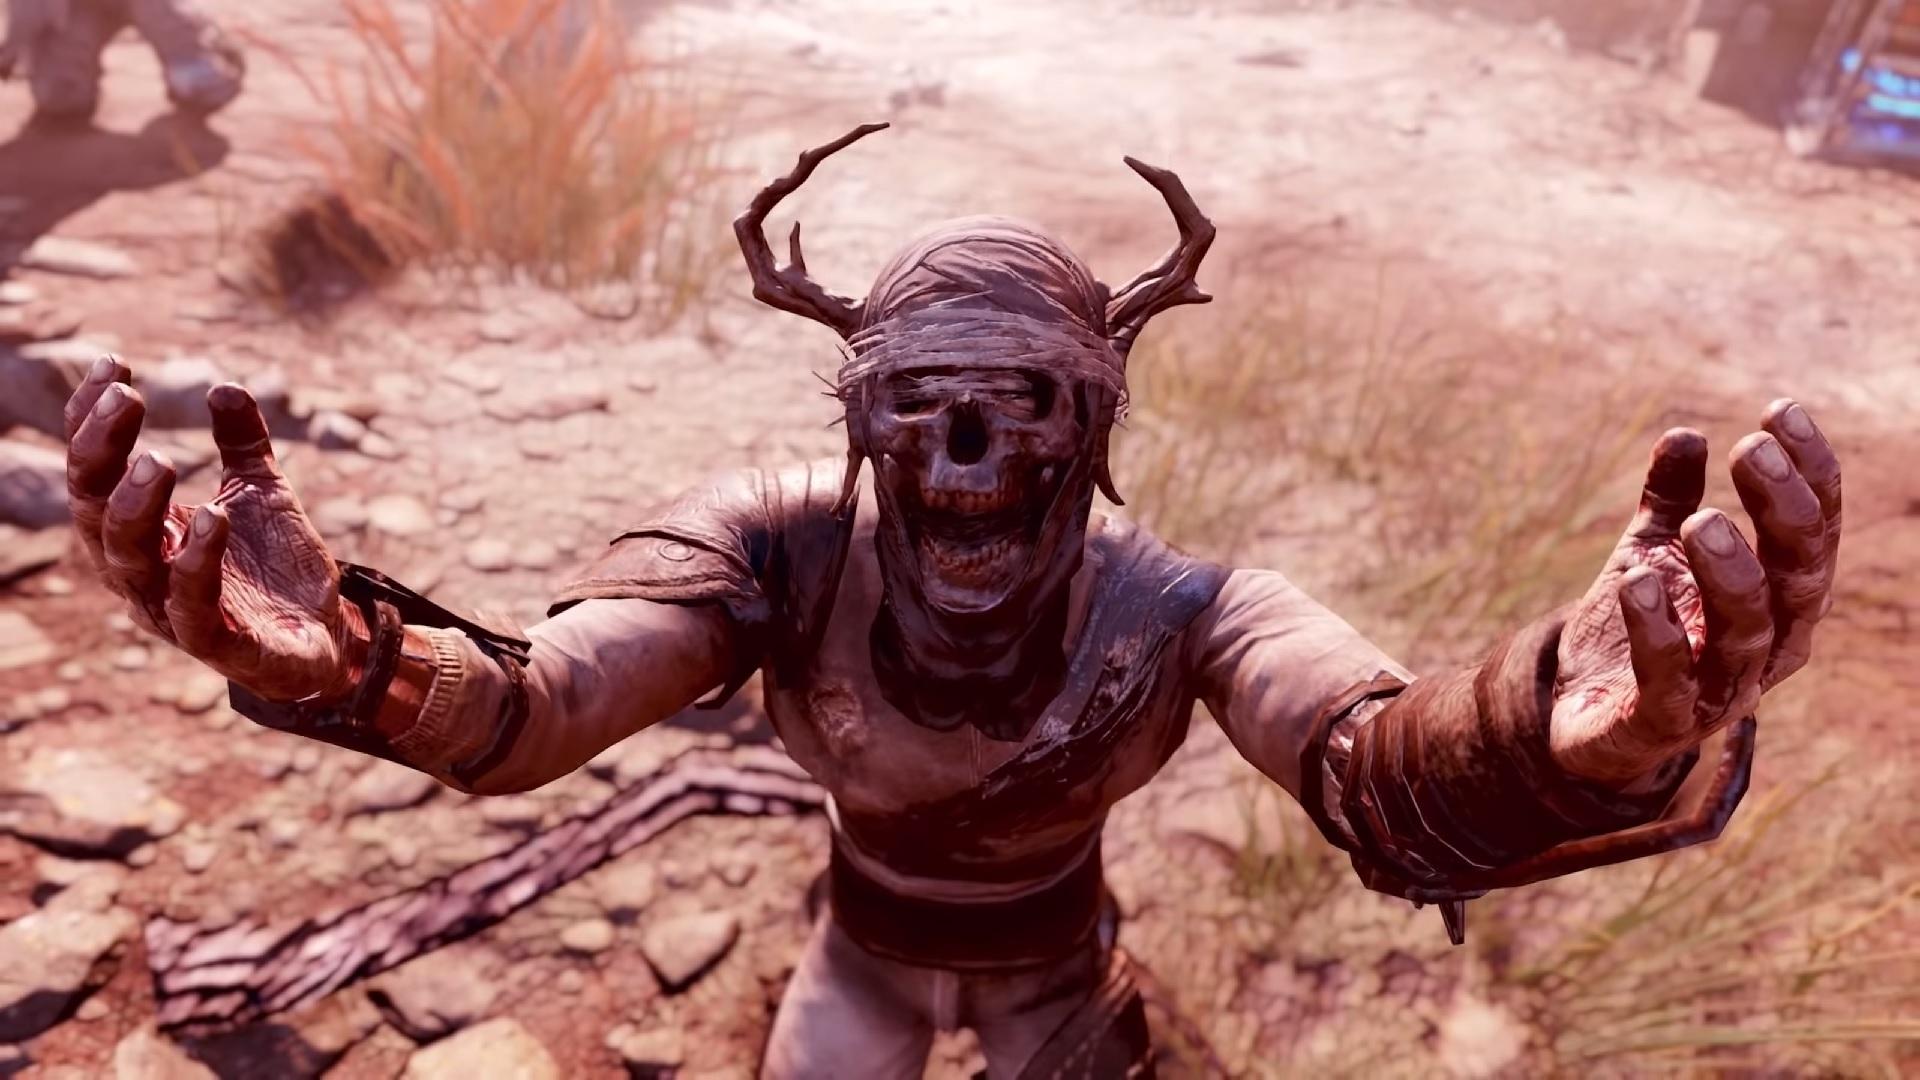 fallout 76 wastelanders release date